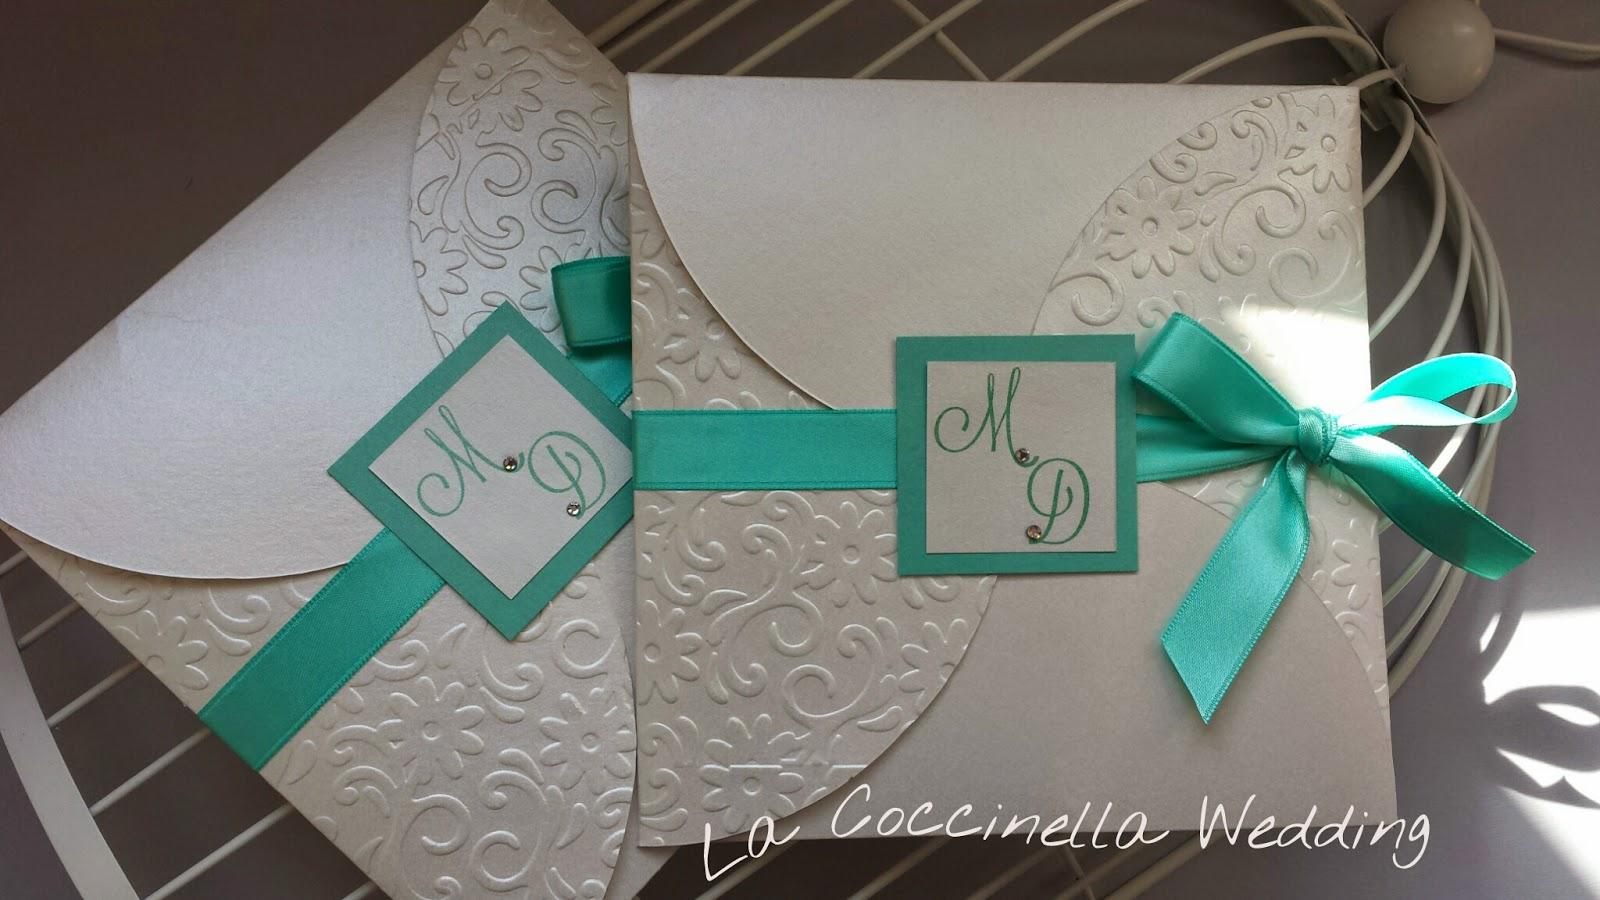 Matrimonio In Verde Tiffany : Partecipazioni matrimonio tiffany qy regardsdefemmes